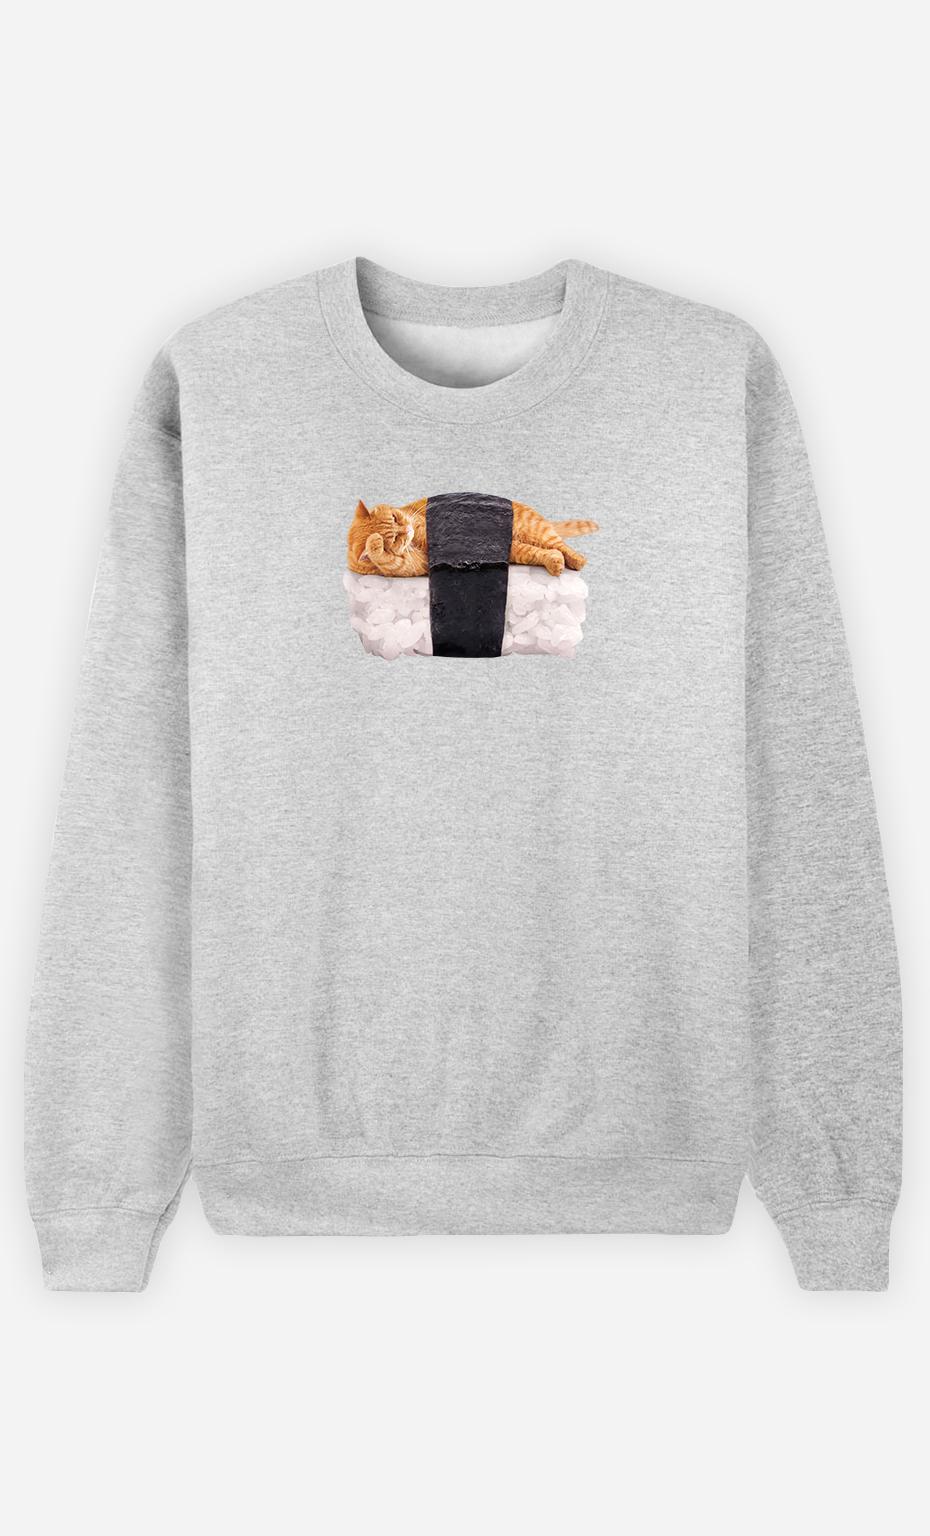 Sweatshirt Homme Sushi Cat